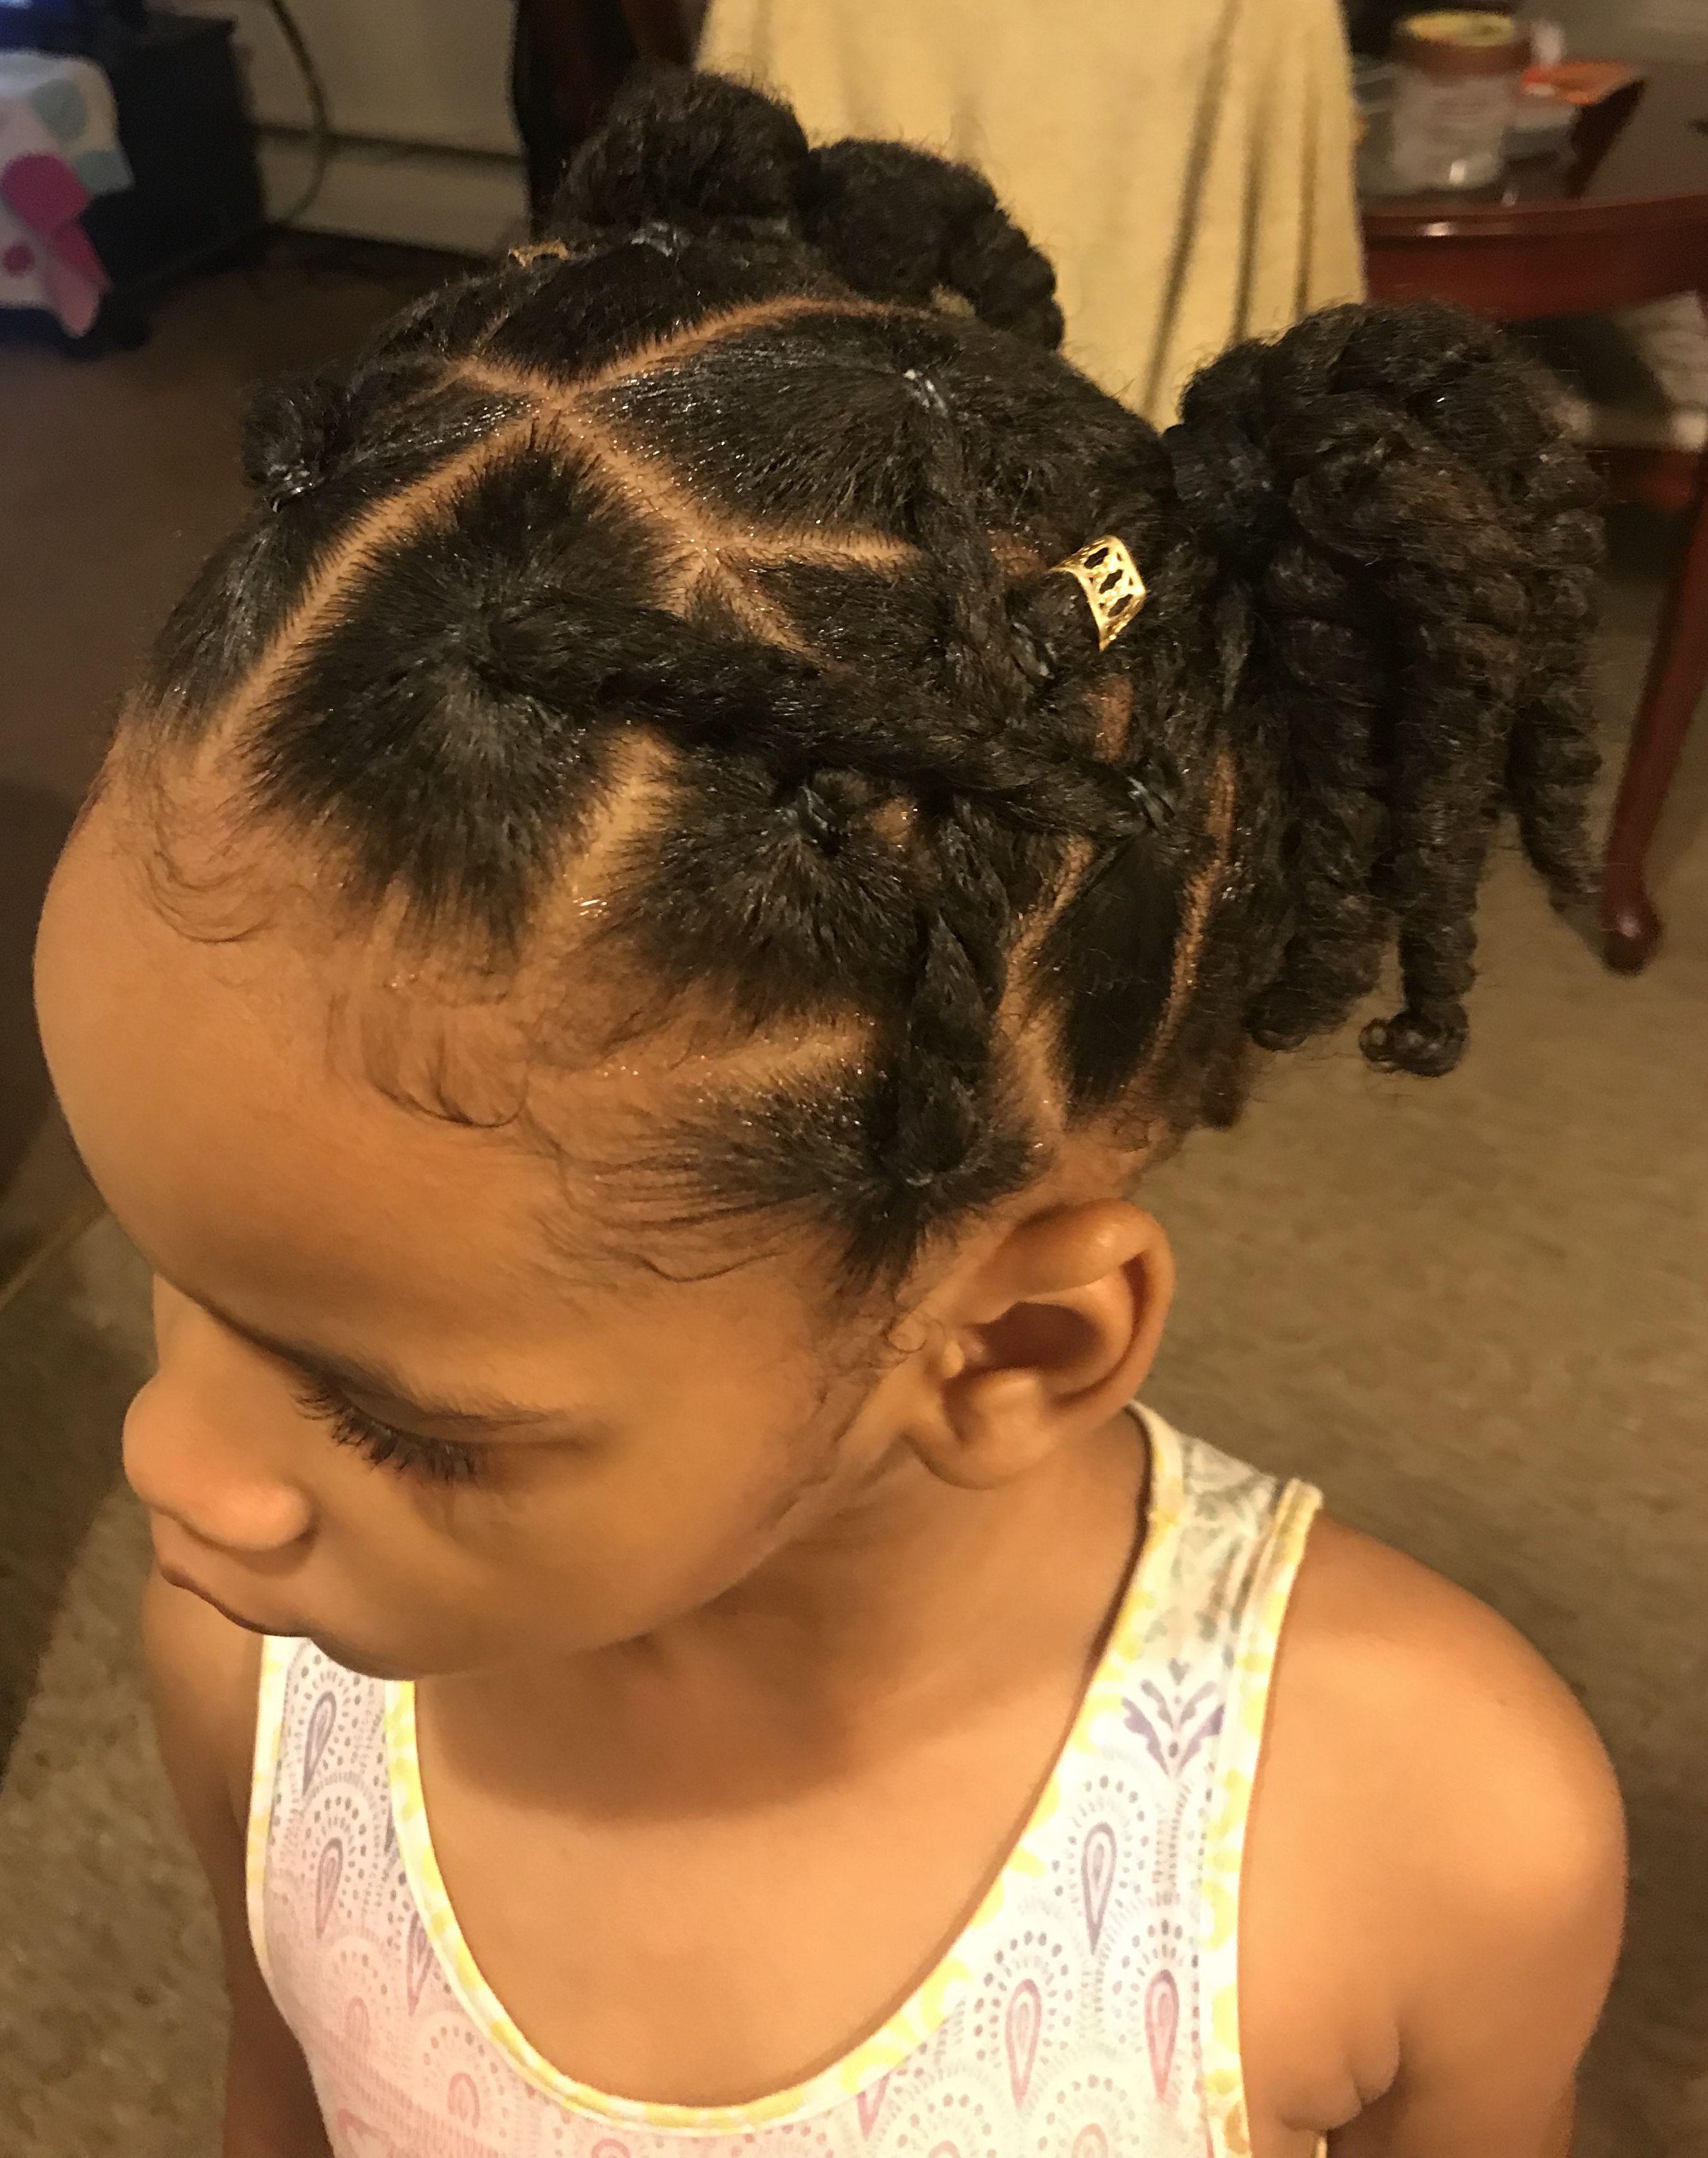 Twist Ponytail Updo Natural Hair Bun Styles Natural Hairstyles For Kids Kids Hairstyles